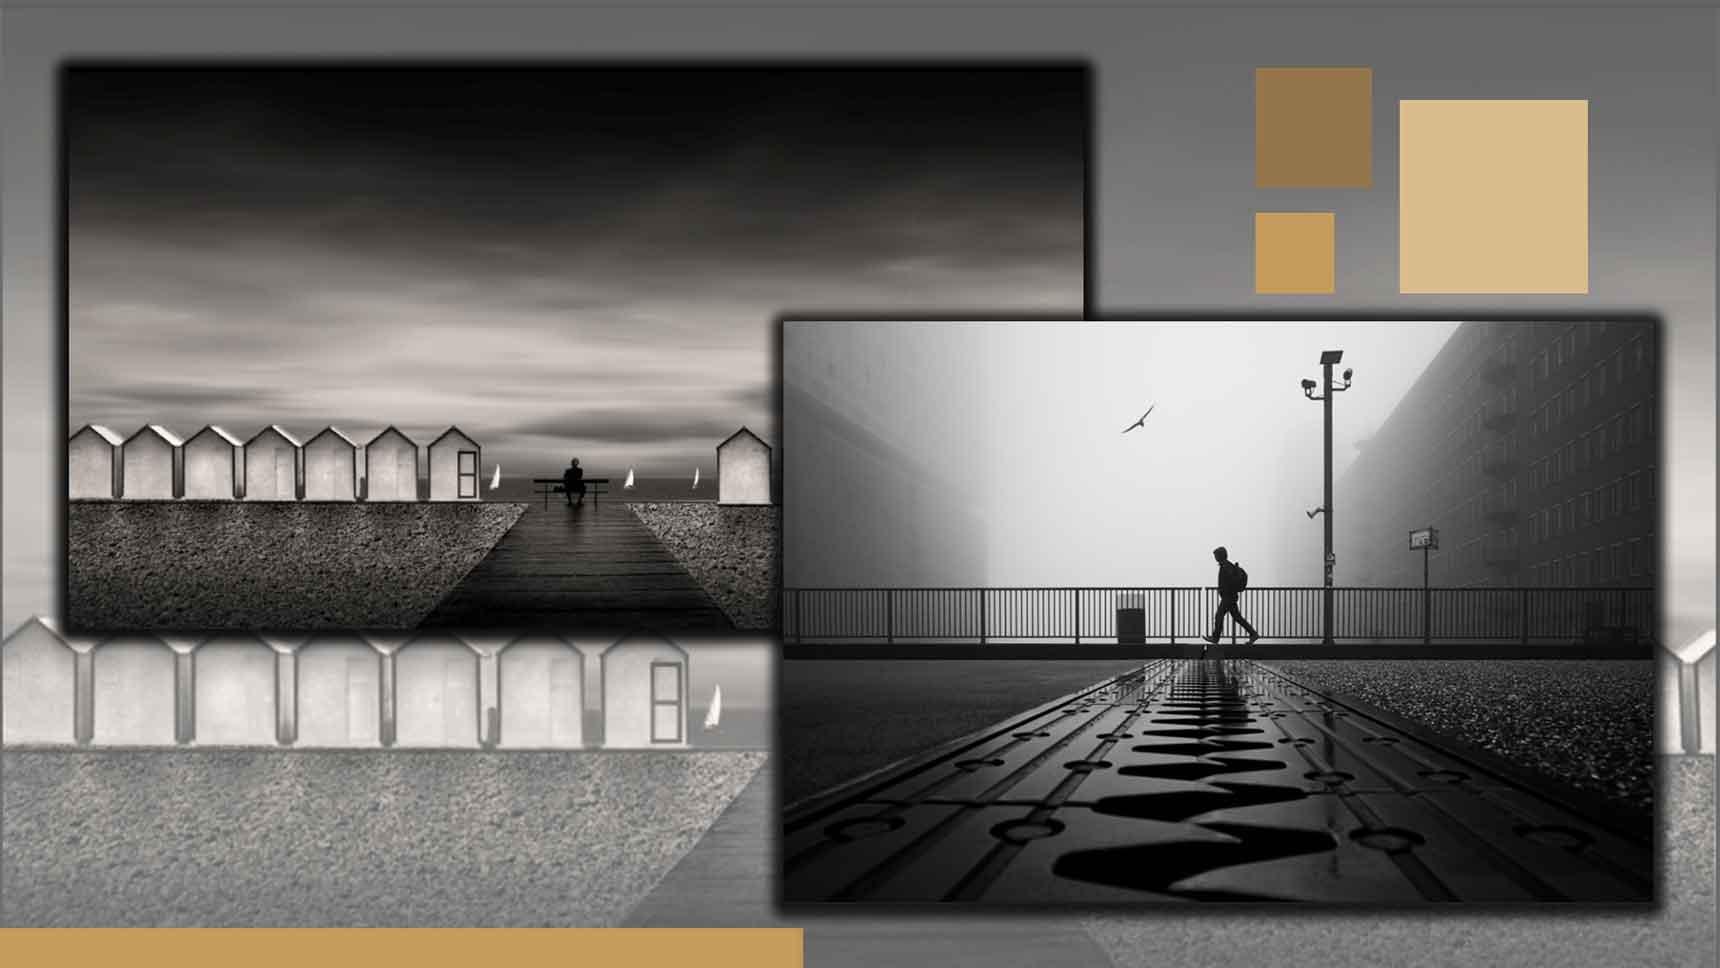 Black and White World 2 - چگونه می توان تصاویر را تک رنگ فرض کرد؟